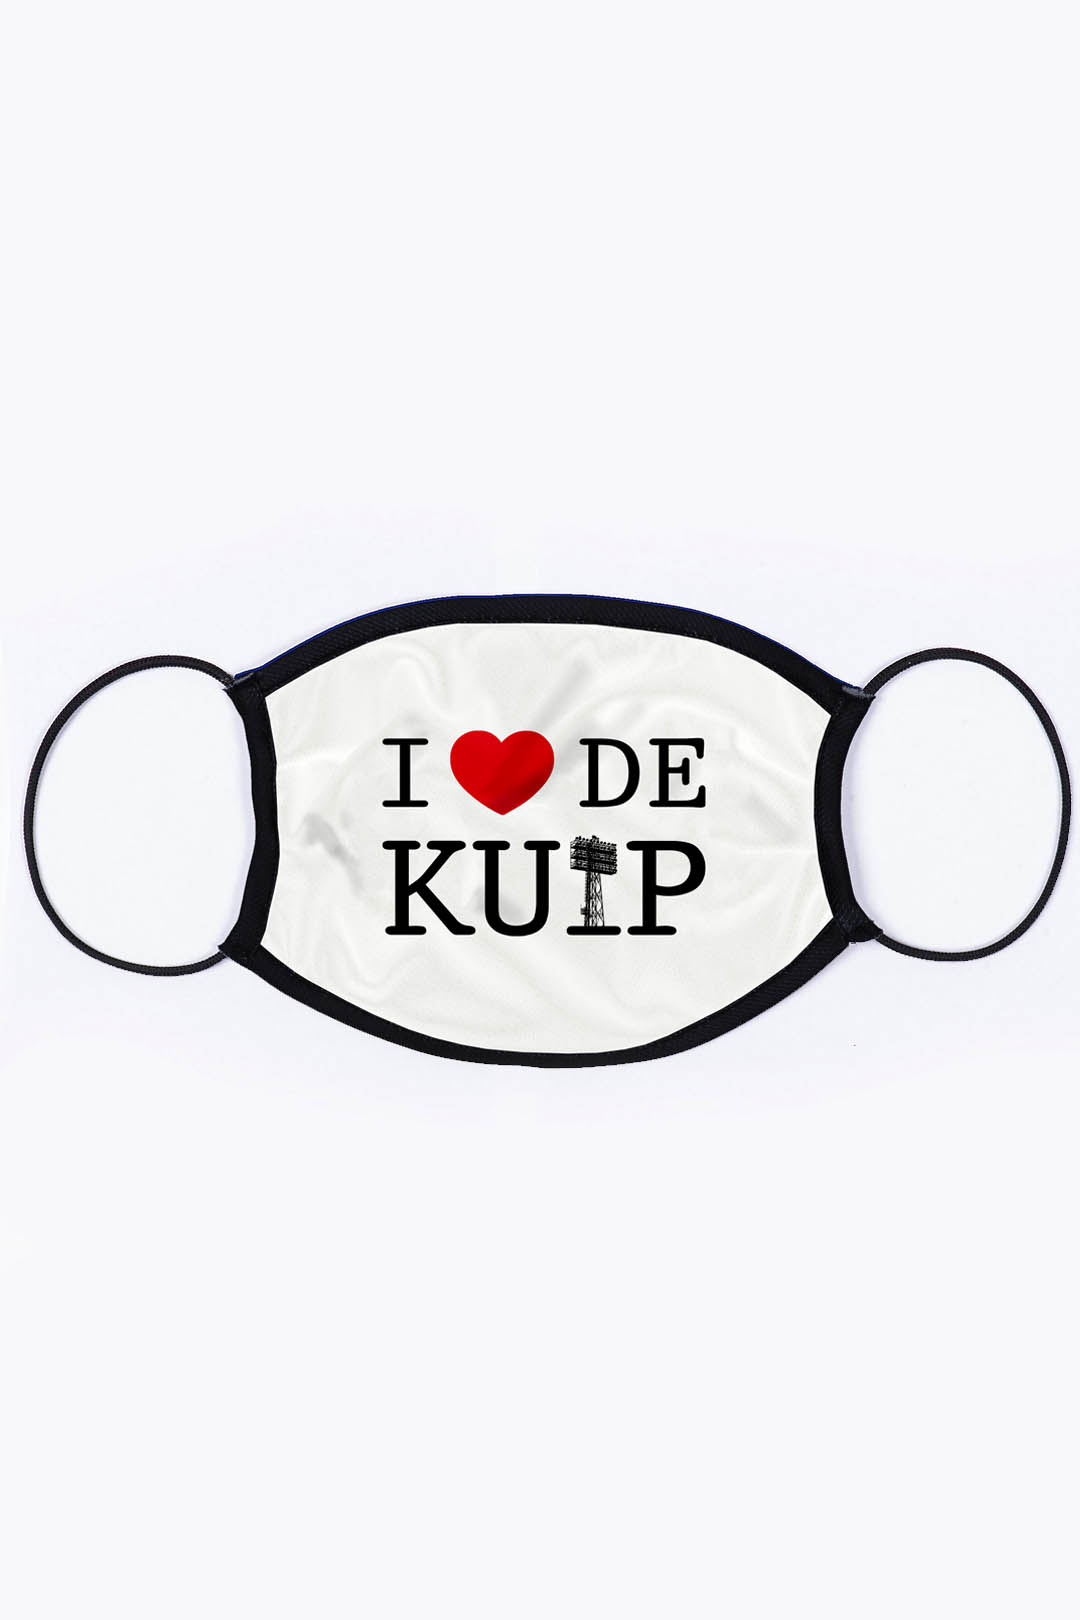 I Love De Kuip - Feyenoord Mondkapje